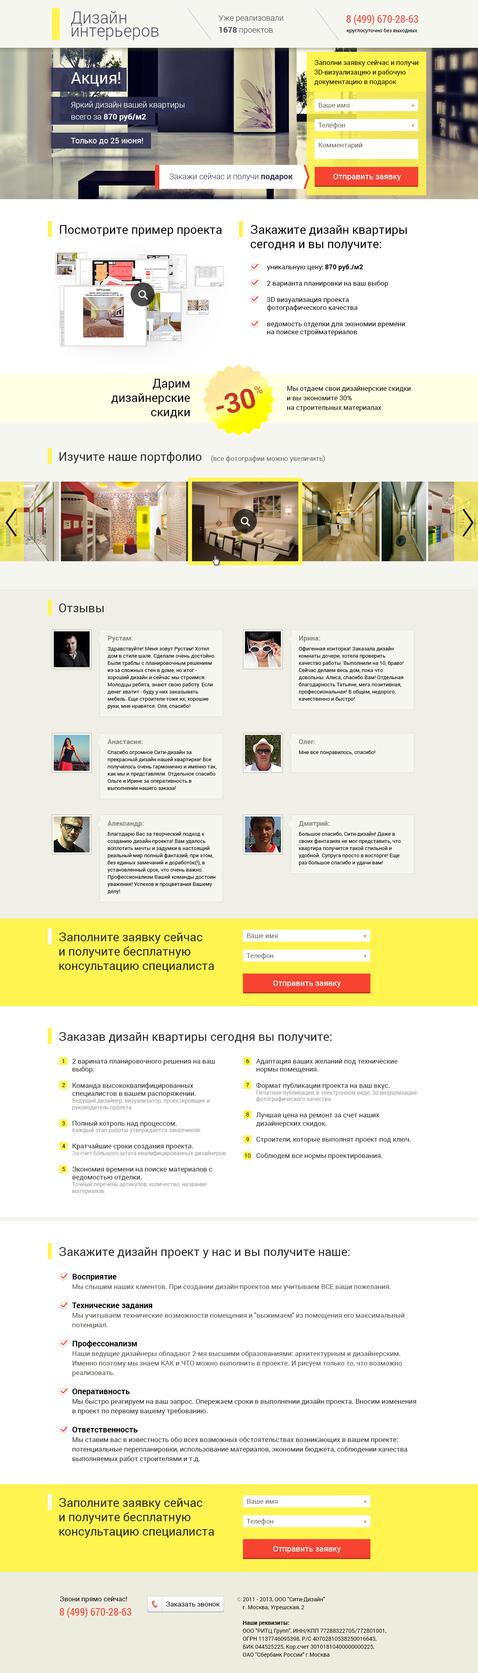 Interior design Landing page V01 by la-Murrr on DeviantArt